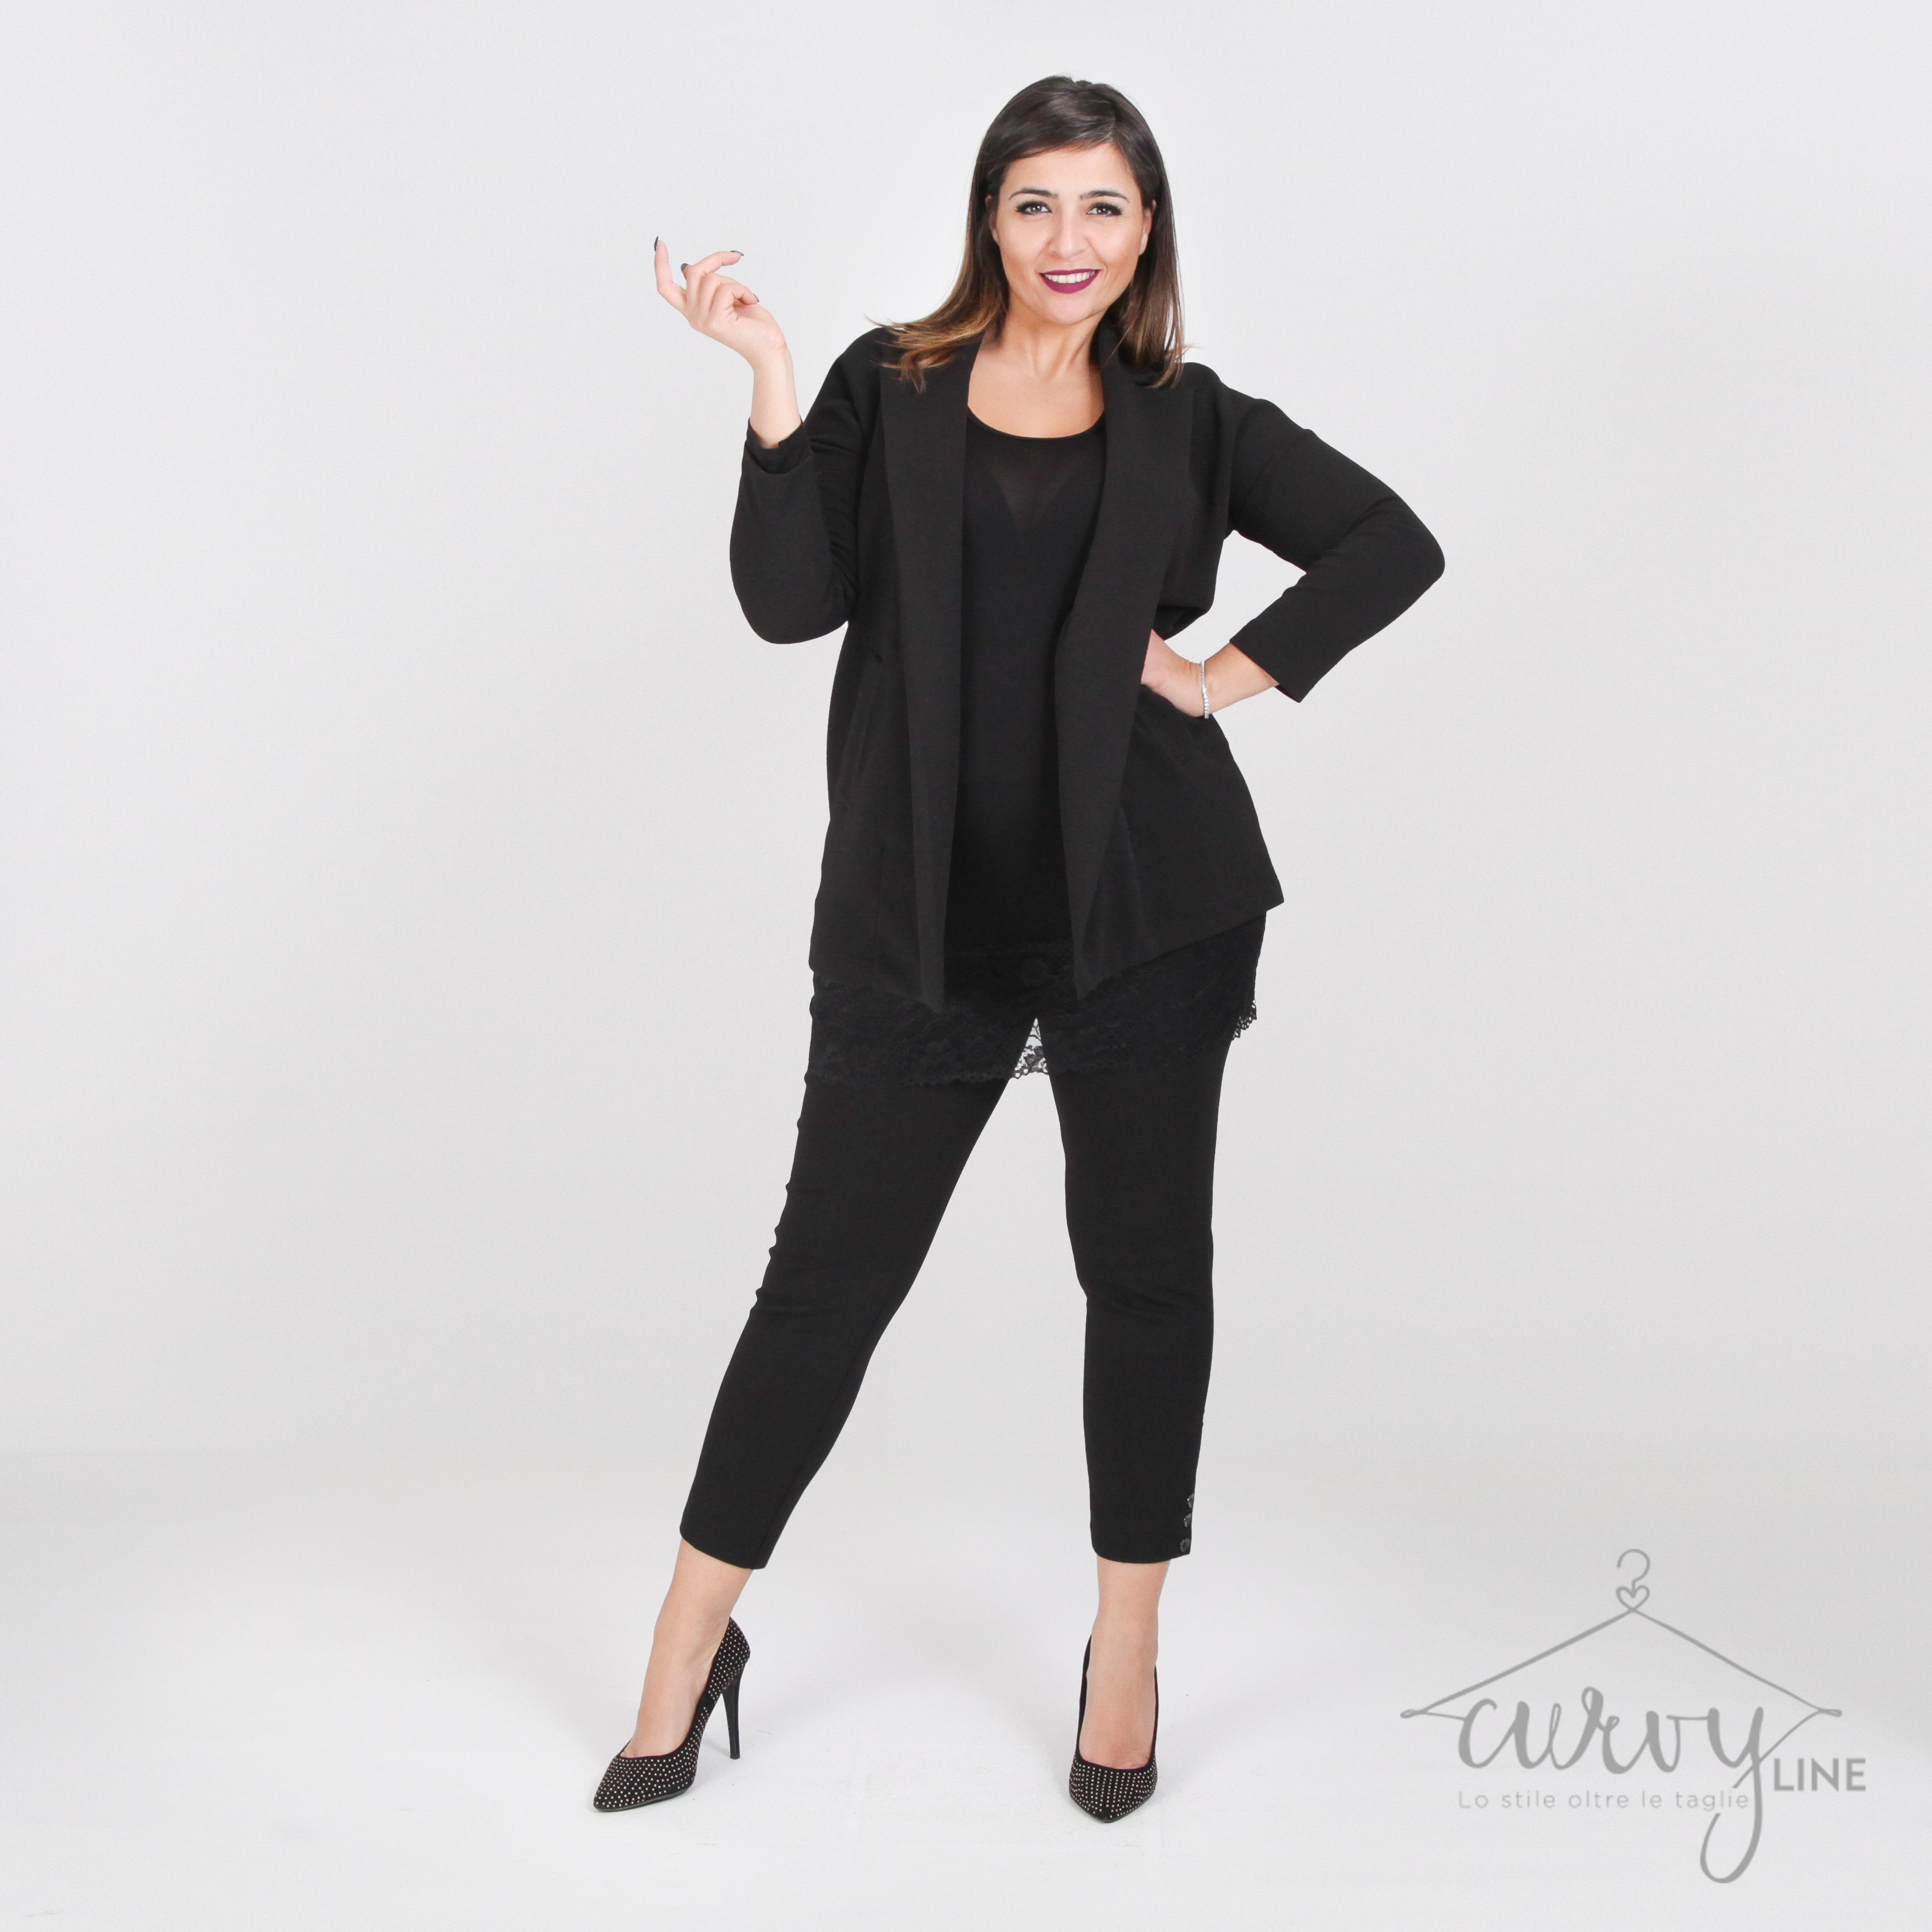 giacca donna elegante xurvy